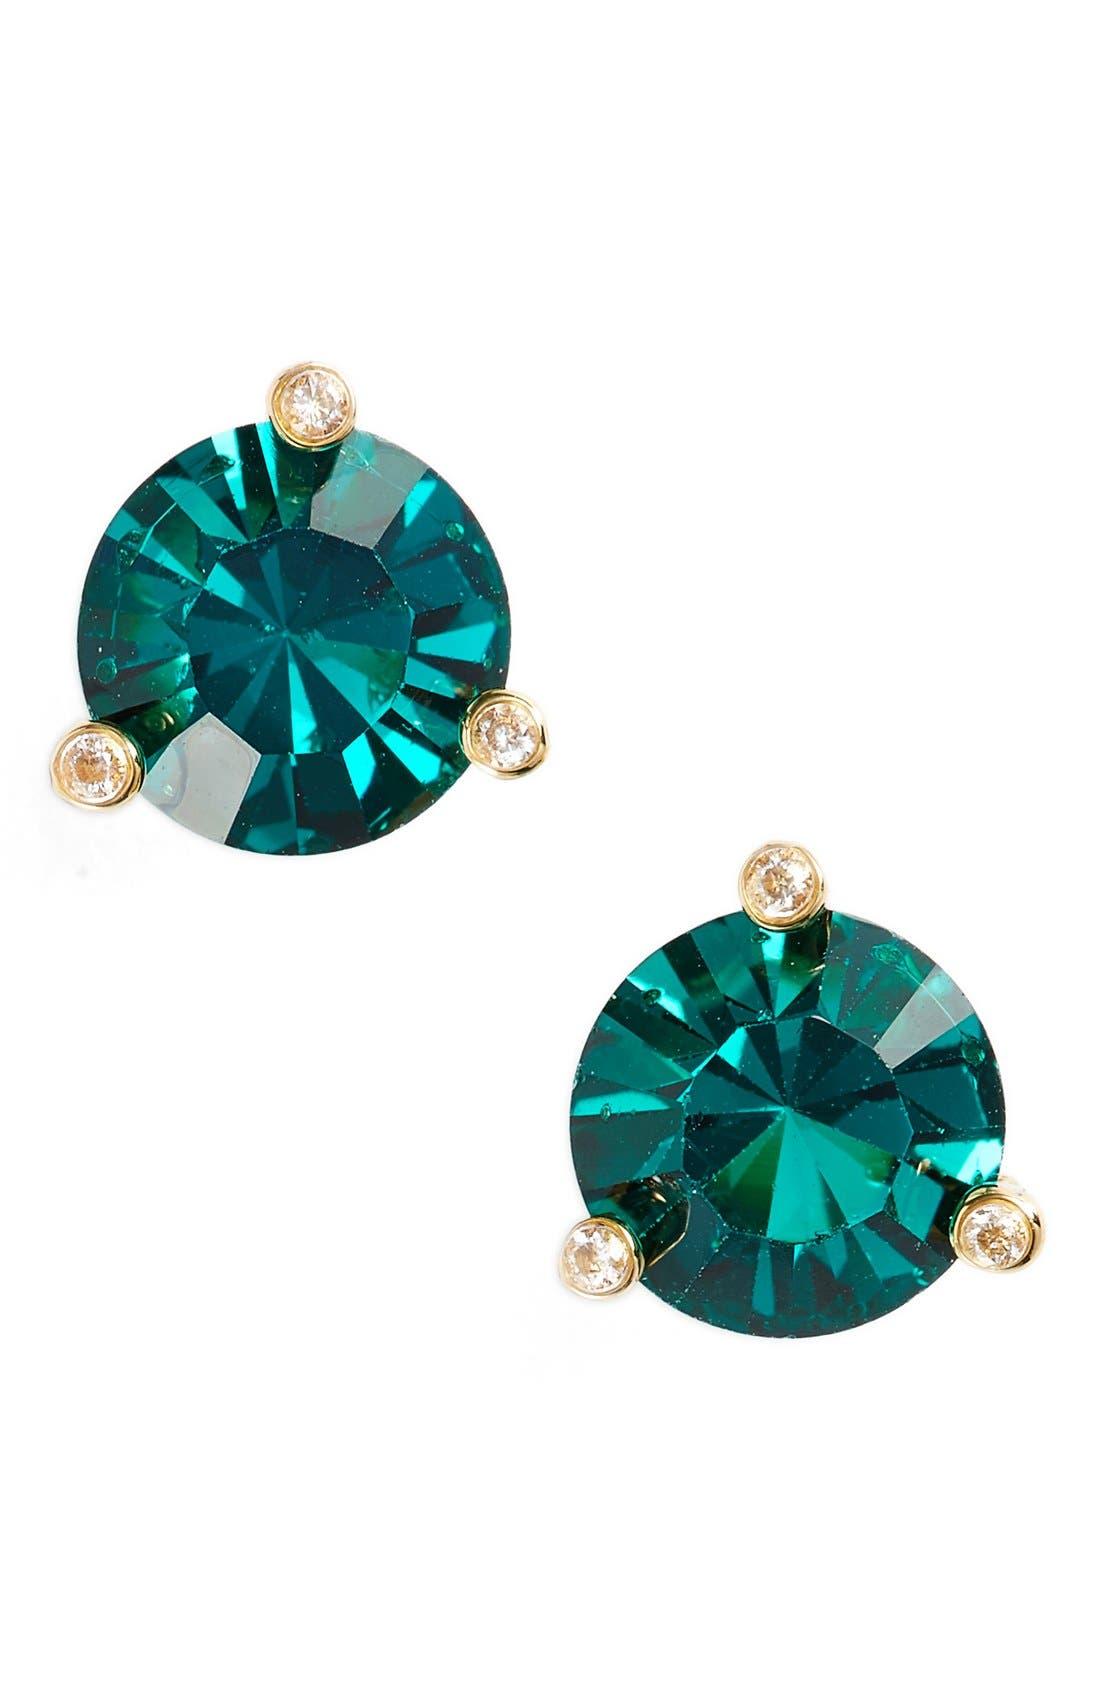 KATE SPADE NEW YORK,                             'rise and shine' stud earrings,                             Main thumbnail 1, color,                             300